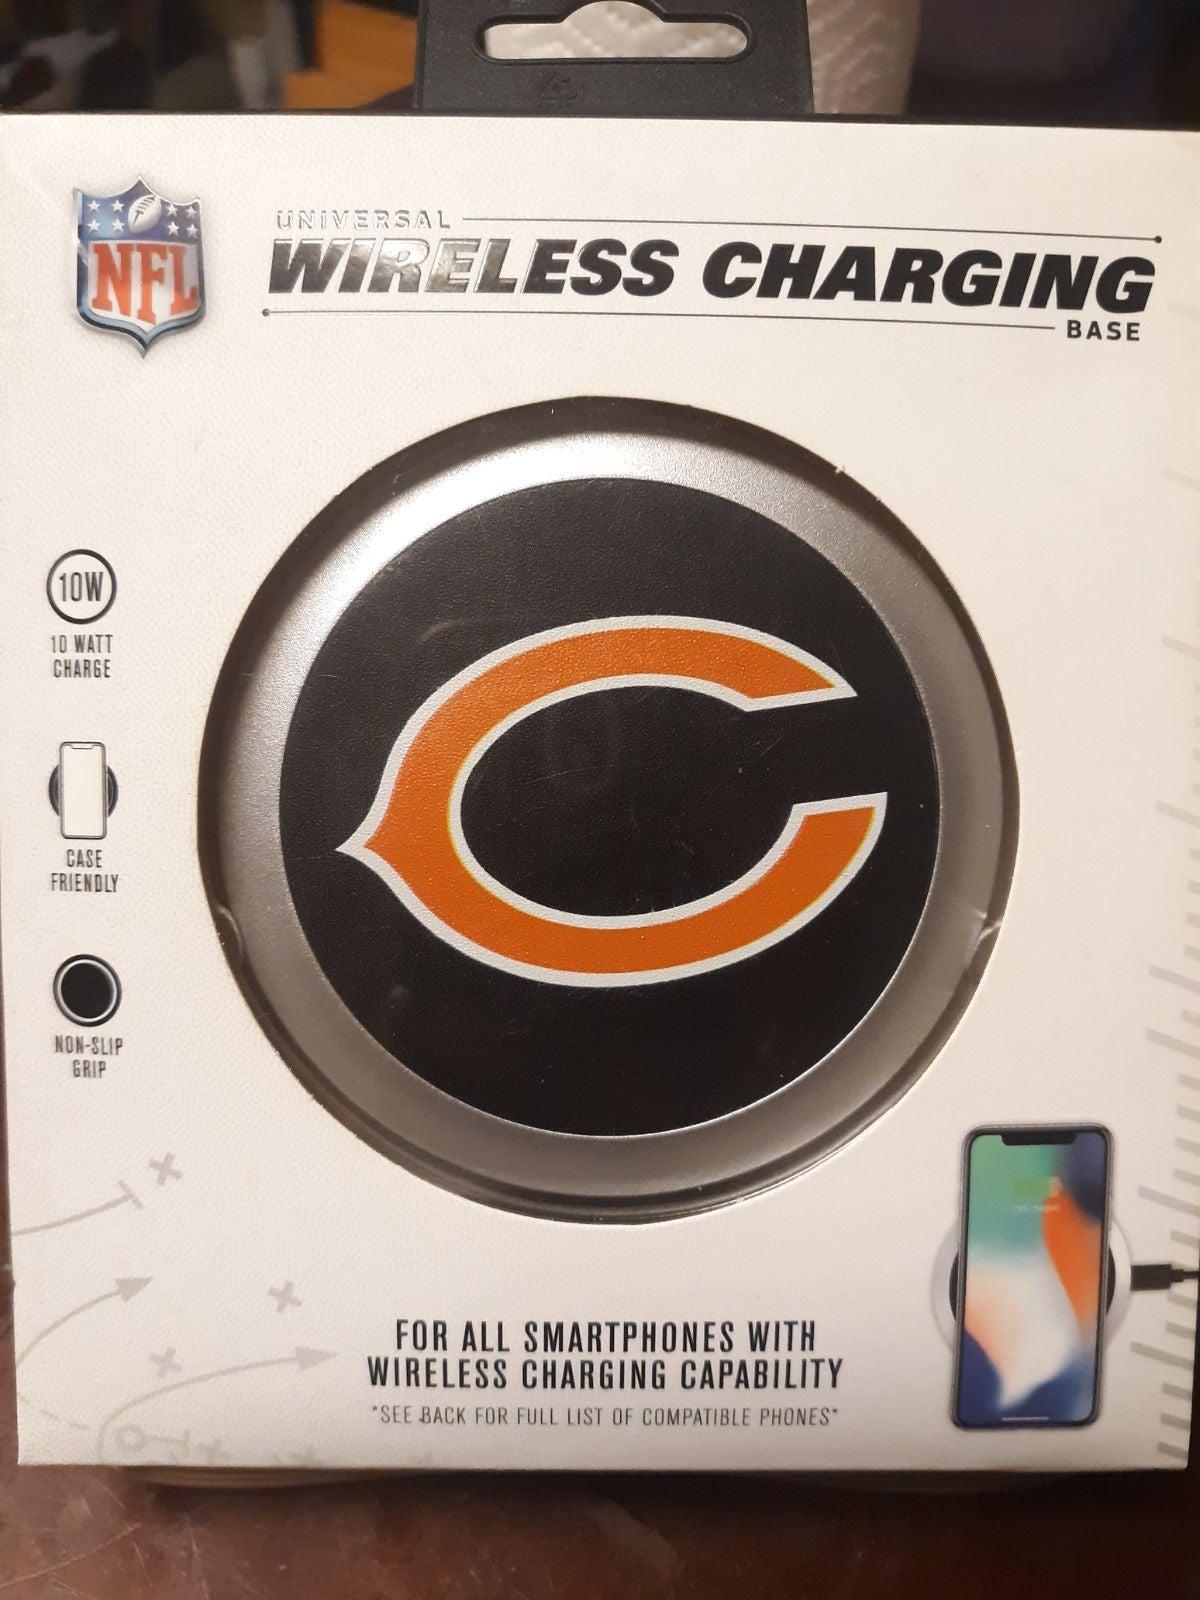 NFL Universal Wireless Charging Base